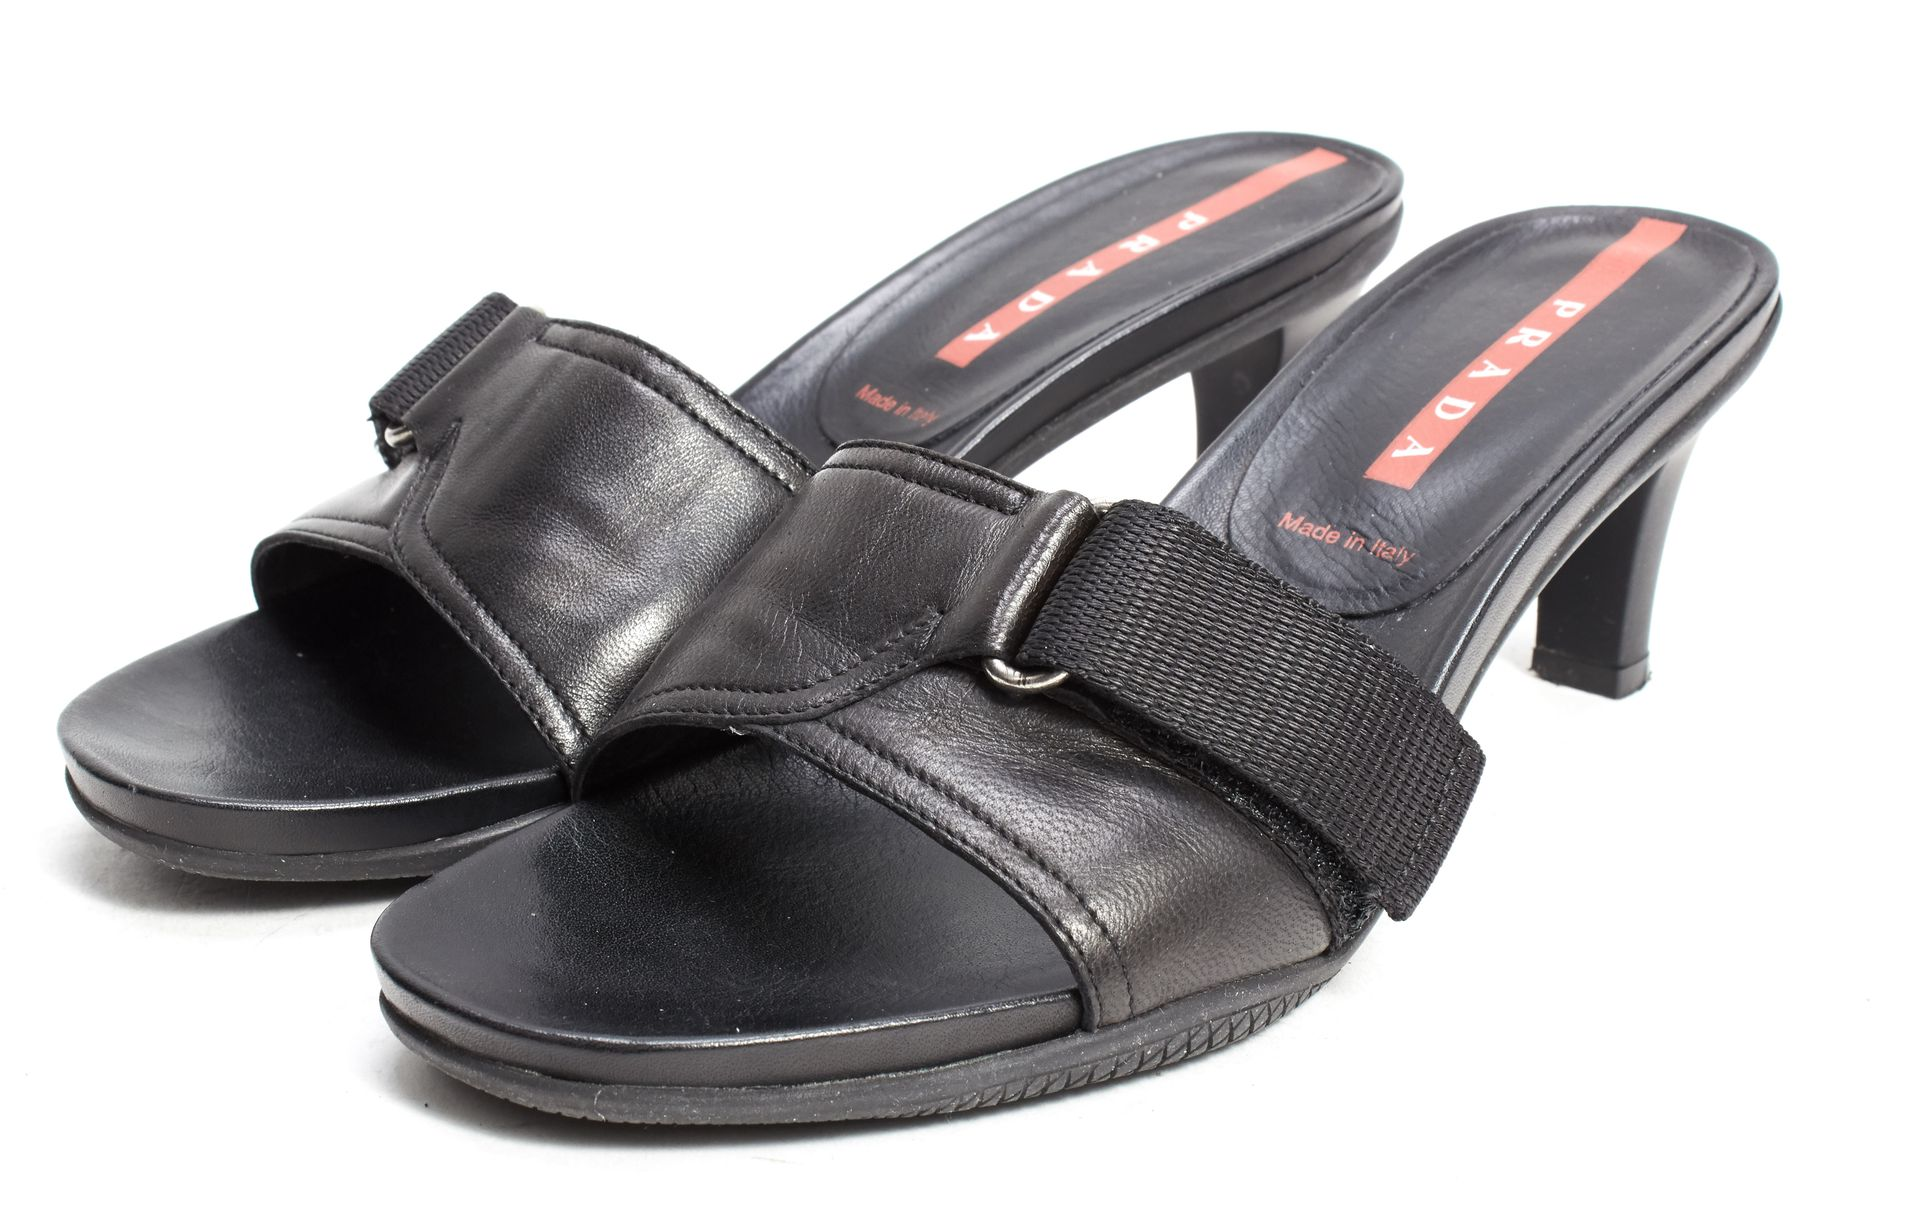 Black leather sandals low heel - Prada Sport Black Leather Low Heel Sandals